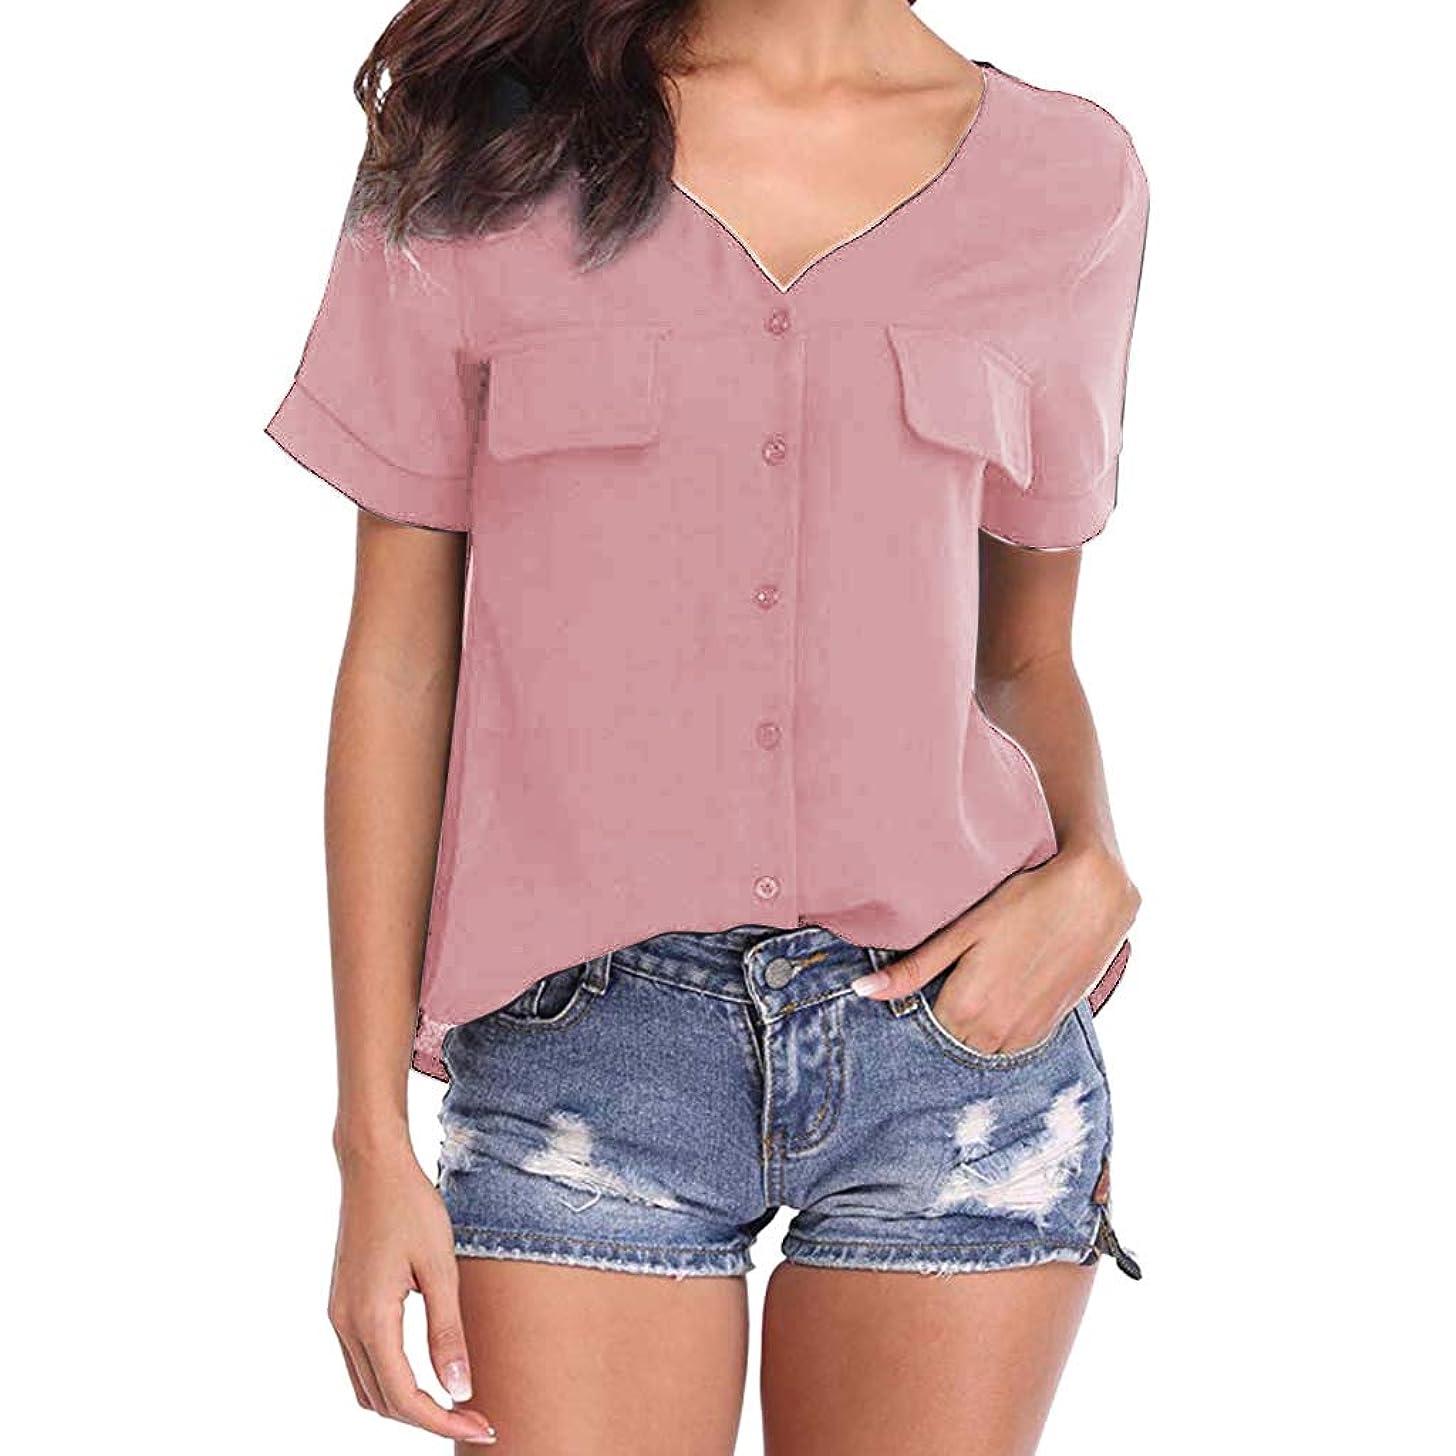 HimTak Women's Petite V Neck Tee Women's Casual Short-Sleeve Button Chiffon Button V-neck Top New Launch T-Shirt